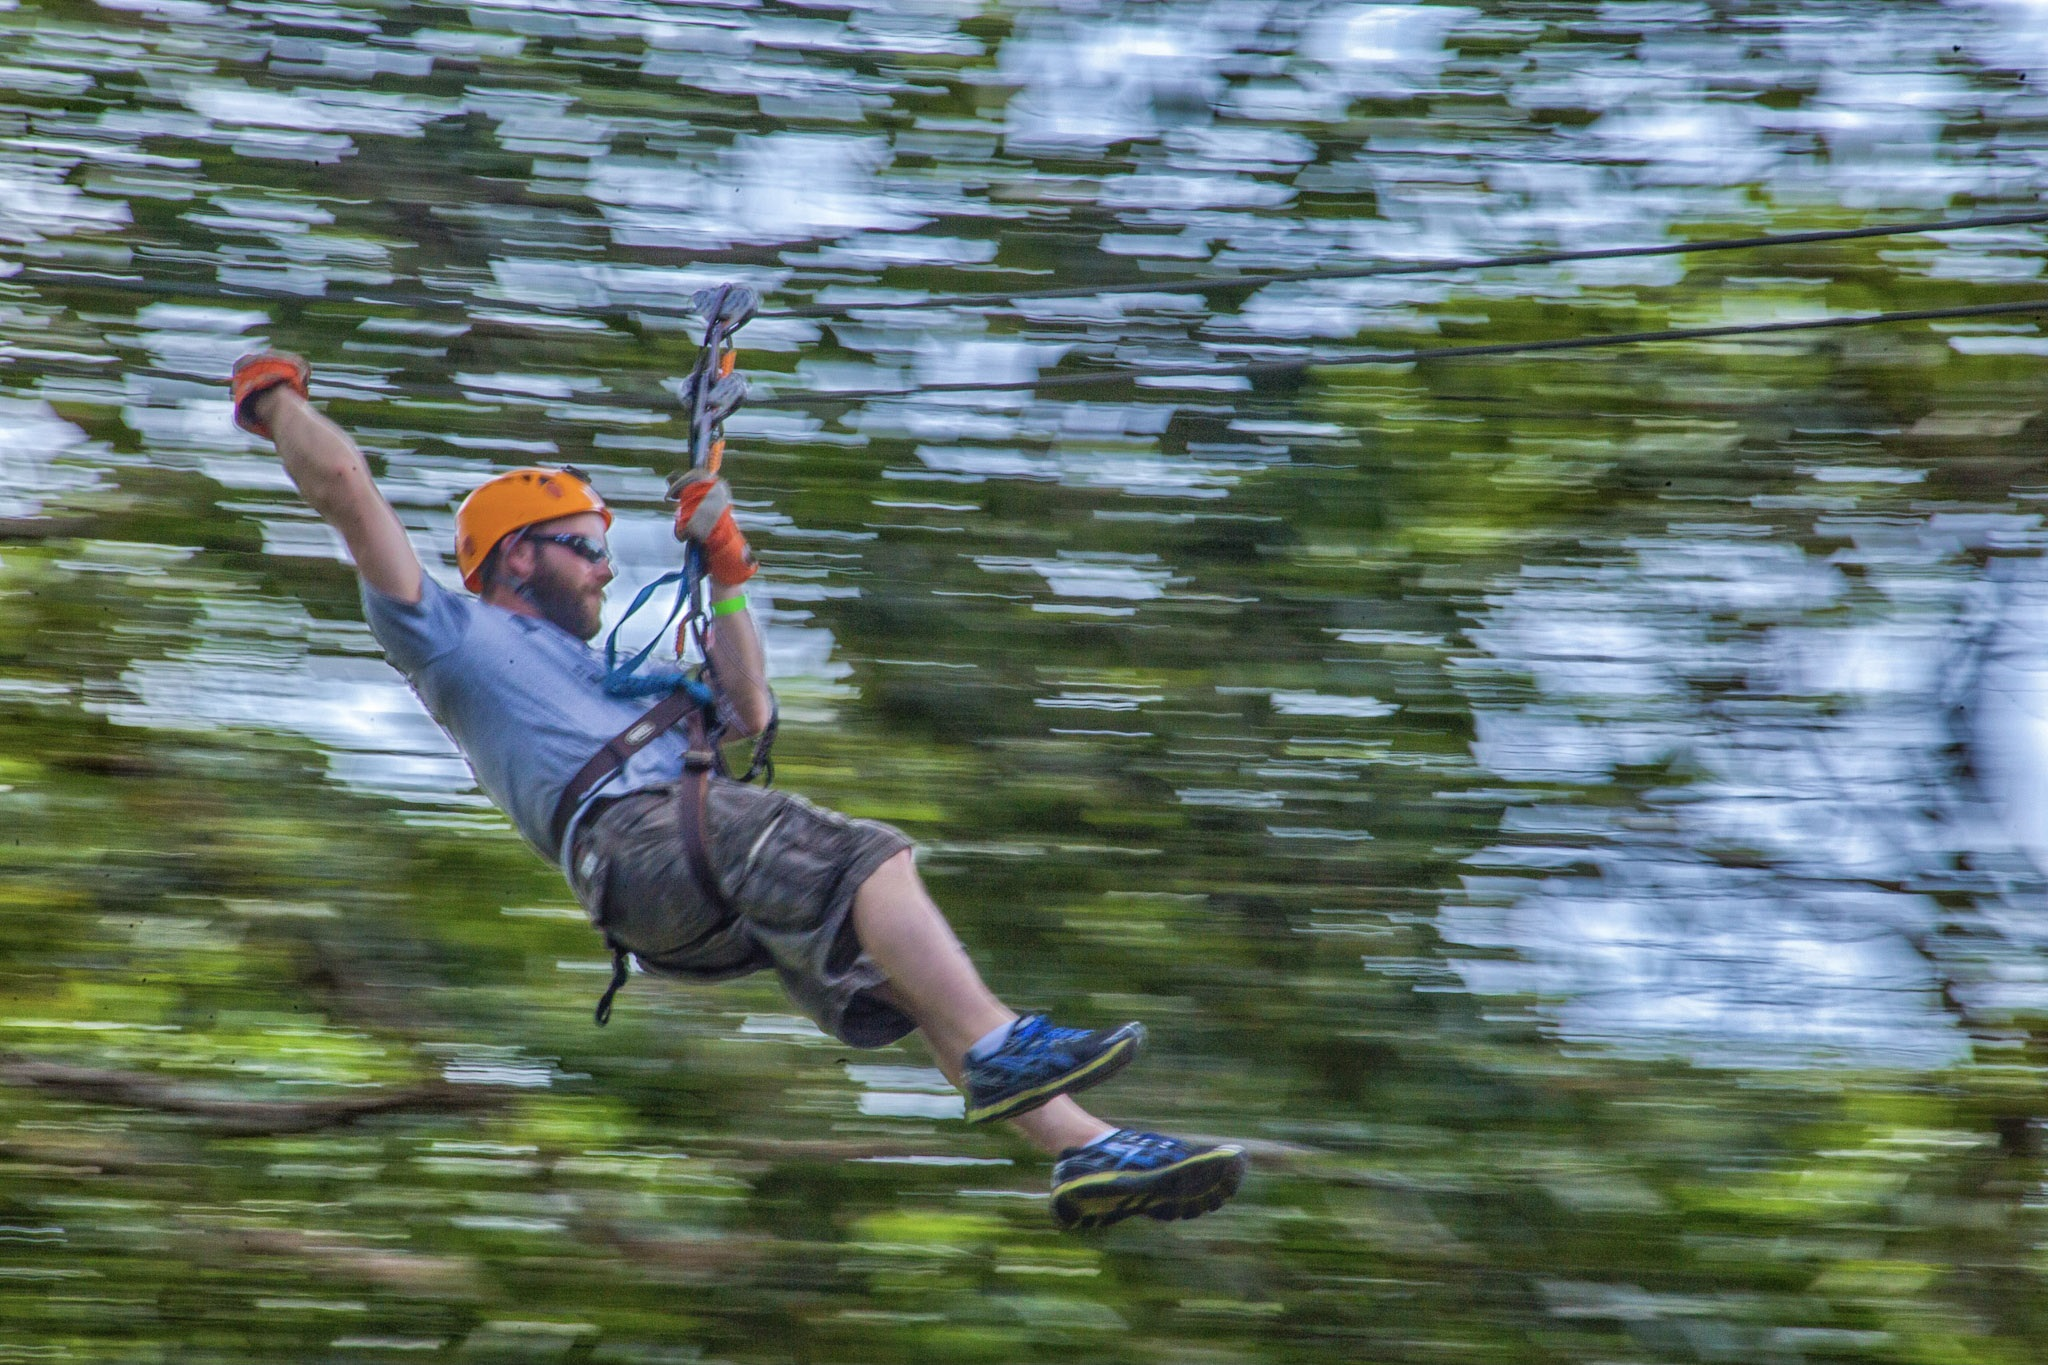 BEL27-ziplining-BocawinaLodge-HotelOwned-77